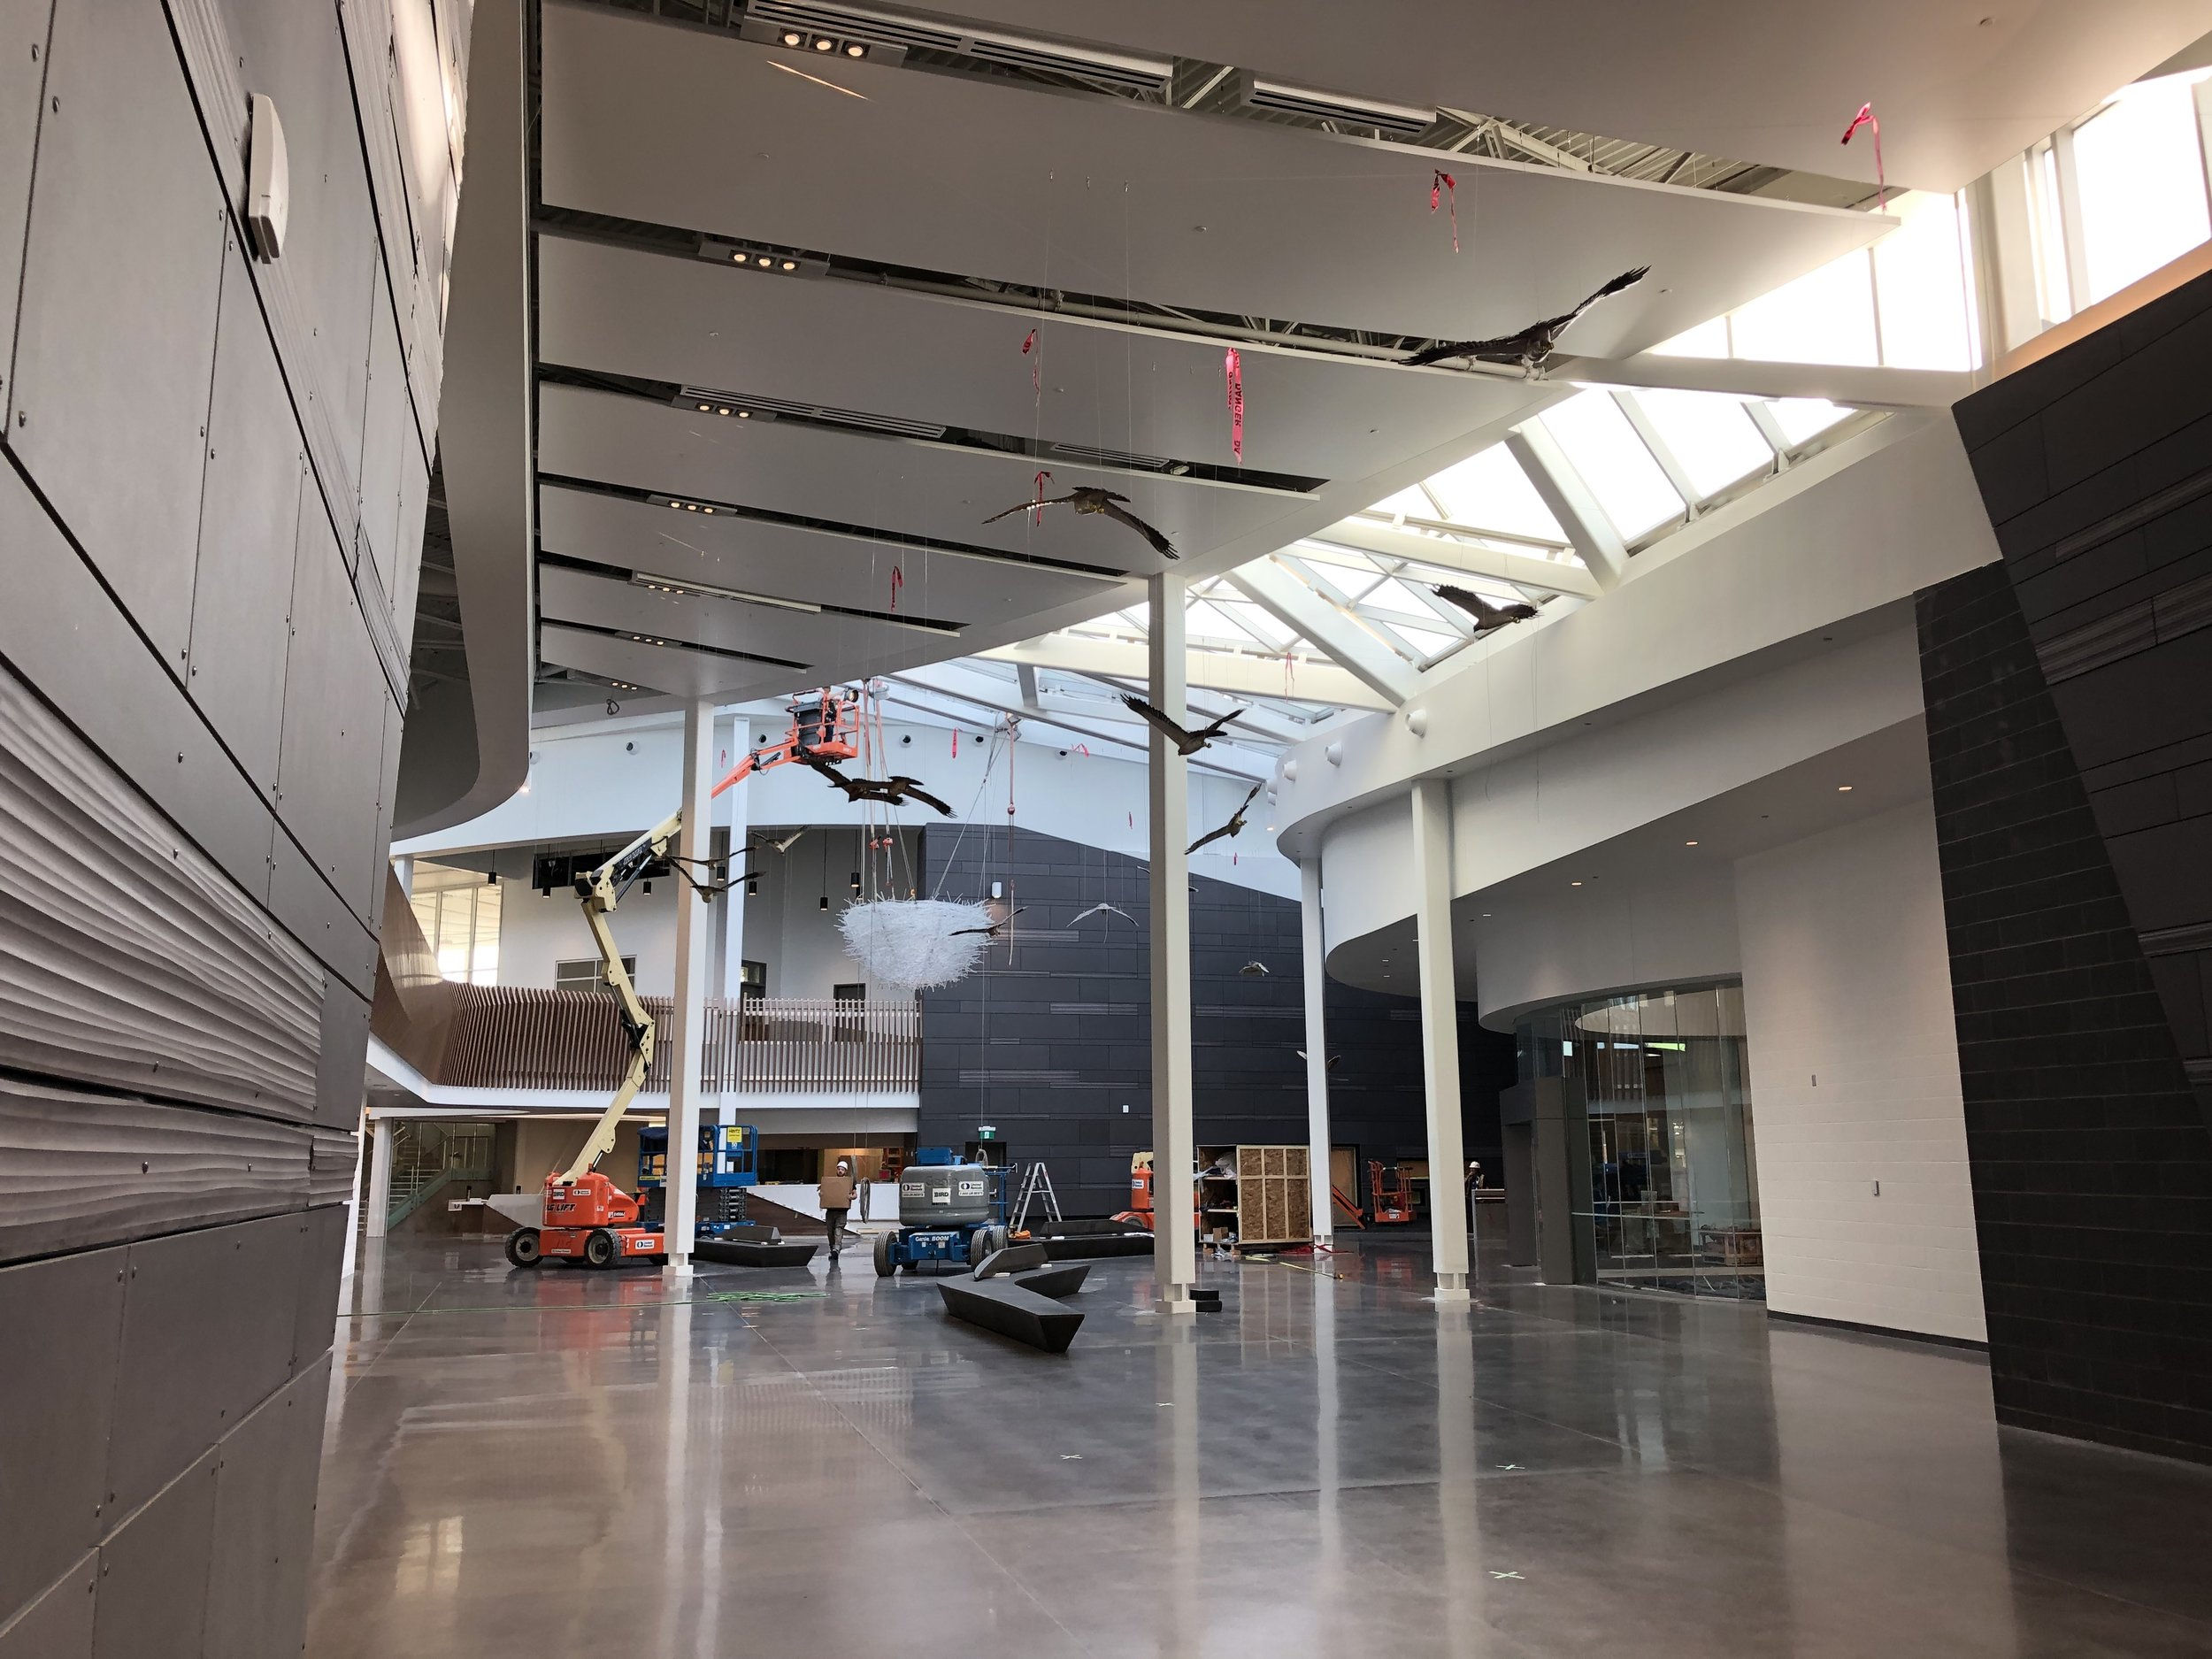 Calgary_The Nest_Donald Lipski_Public Art Services_J Grant Projects_33.jpg